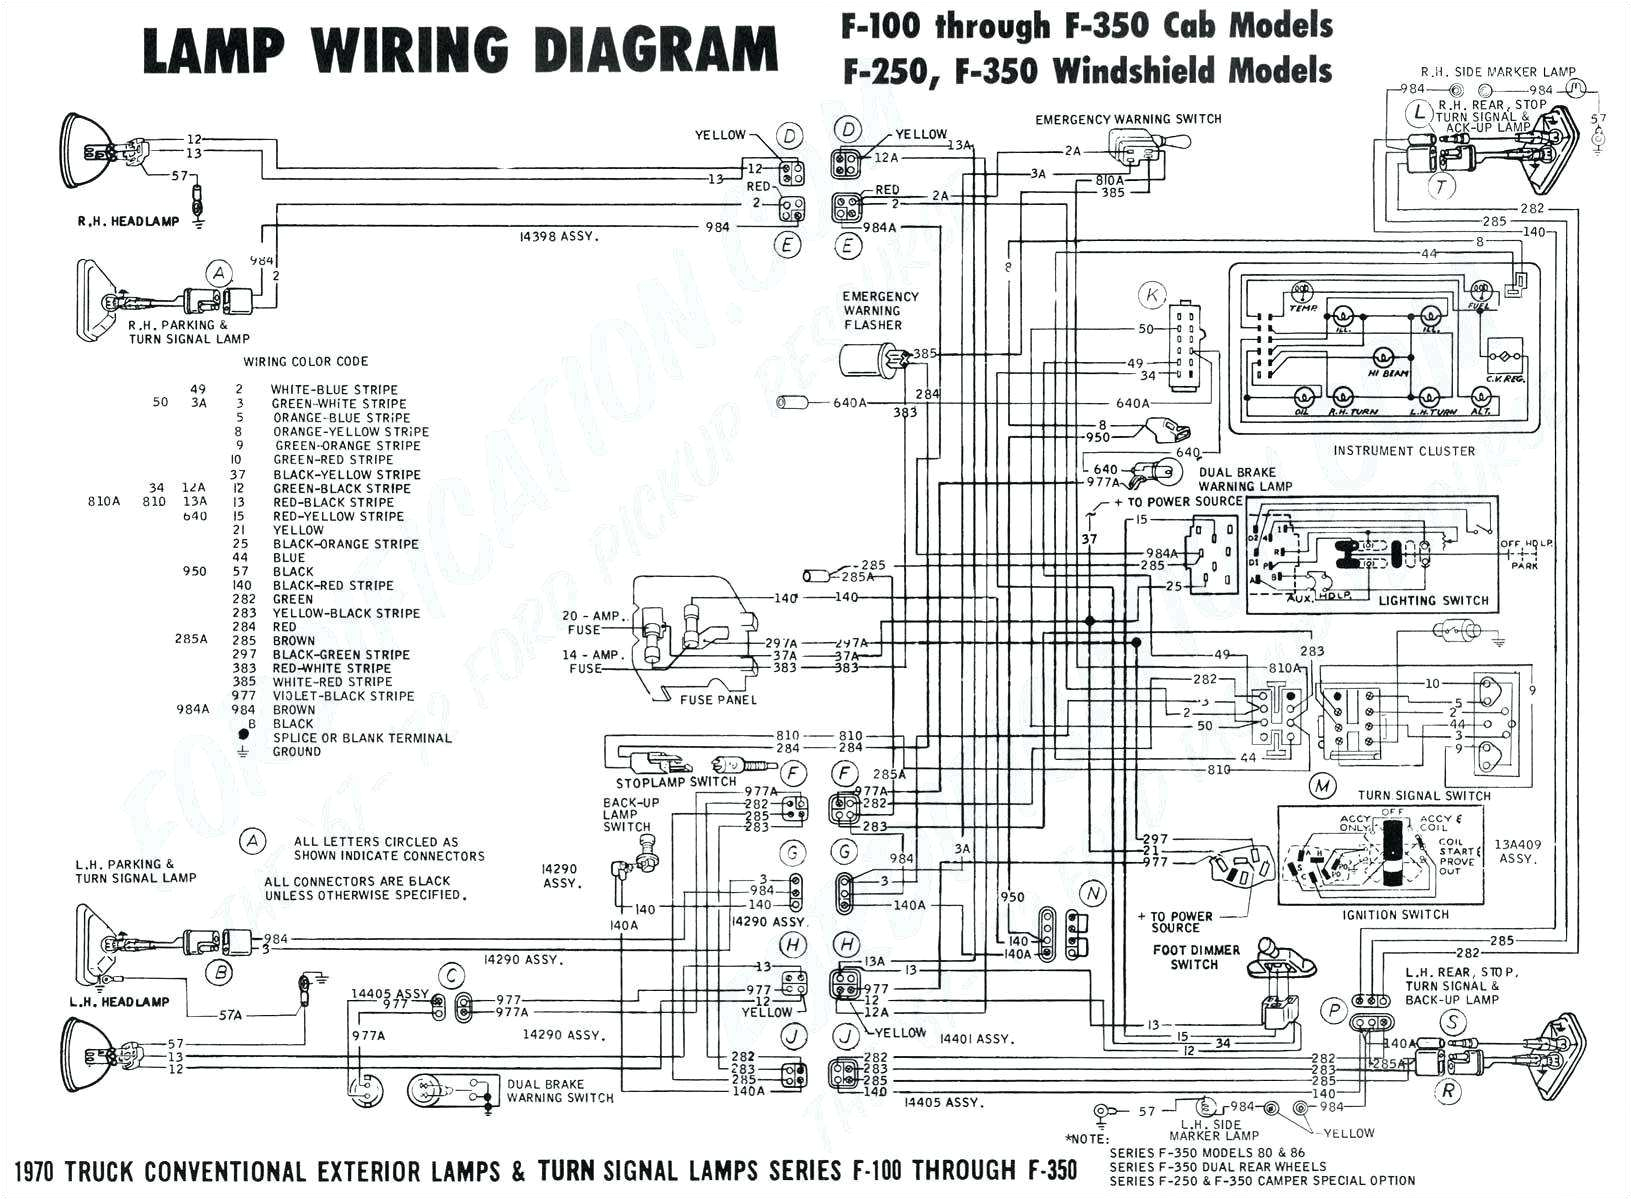 Control Transformer Wiring Diagram 1998 Range Rover Abs Pressure Control Switch Wiring Diagram Wiring